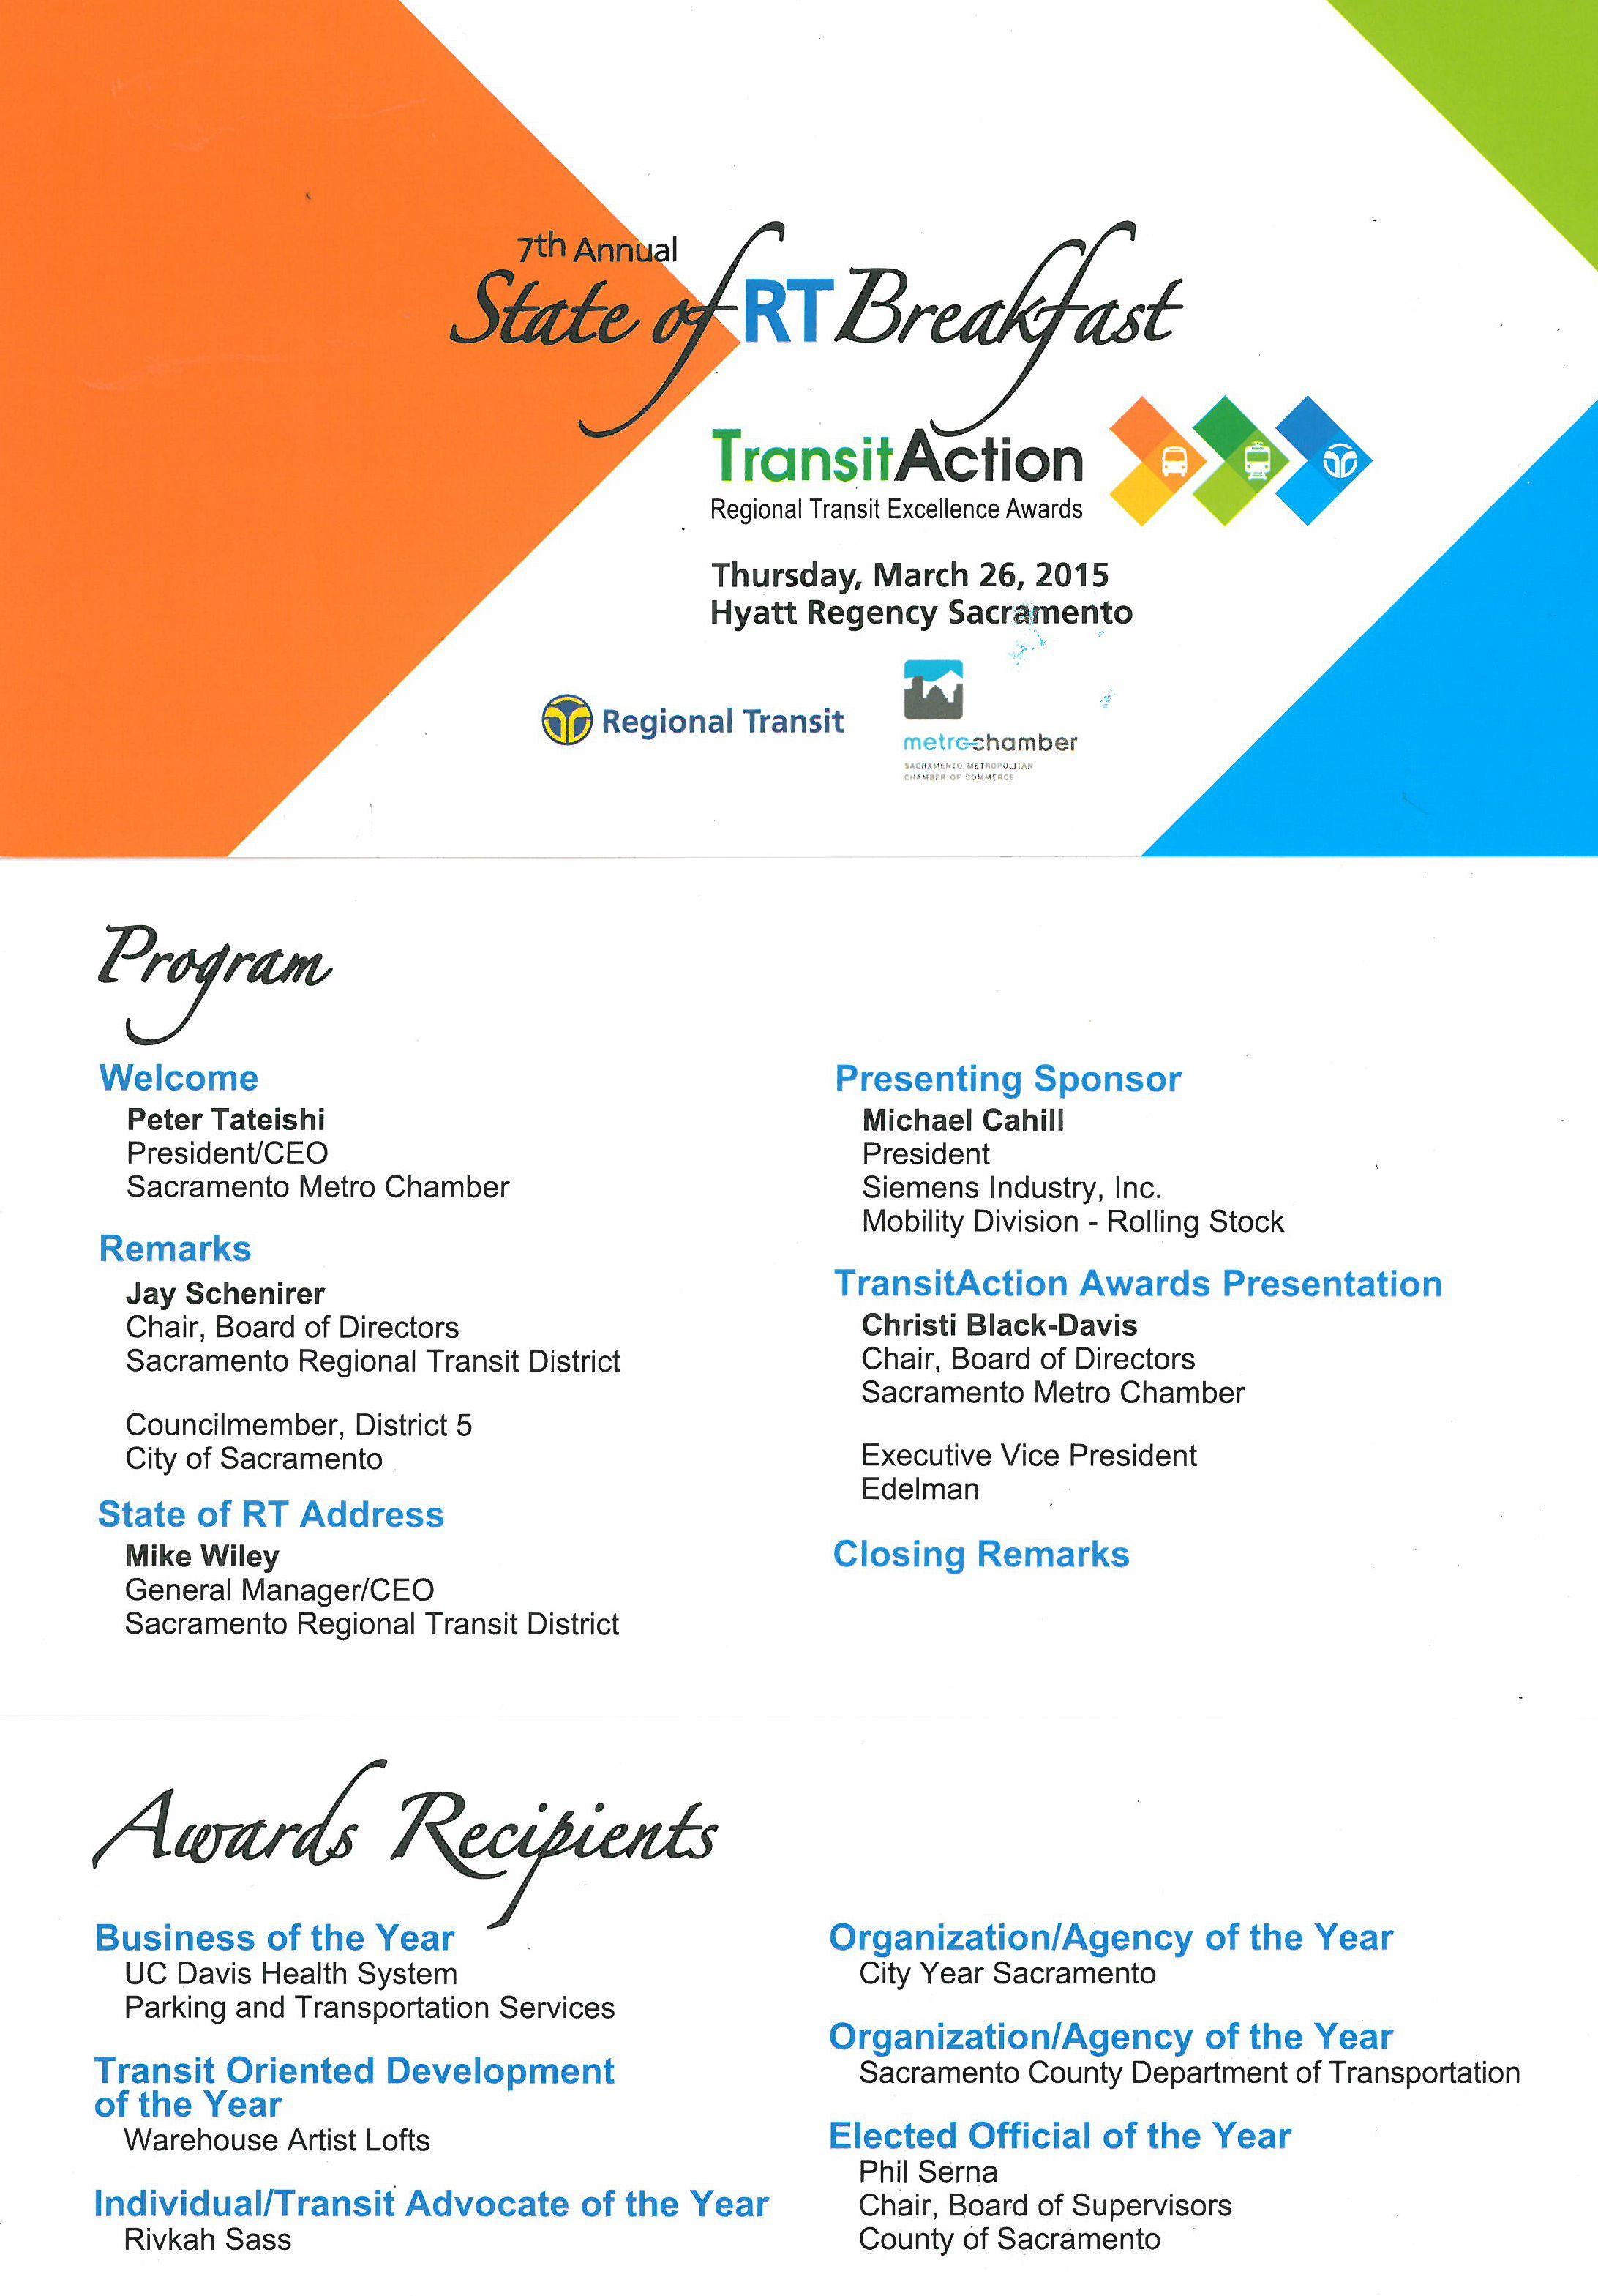 Regional Transit Excellence Award